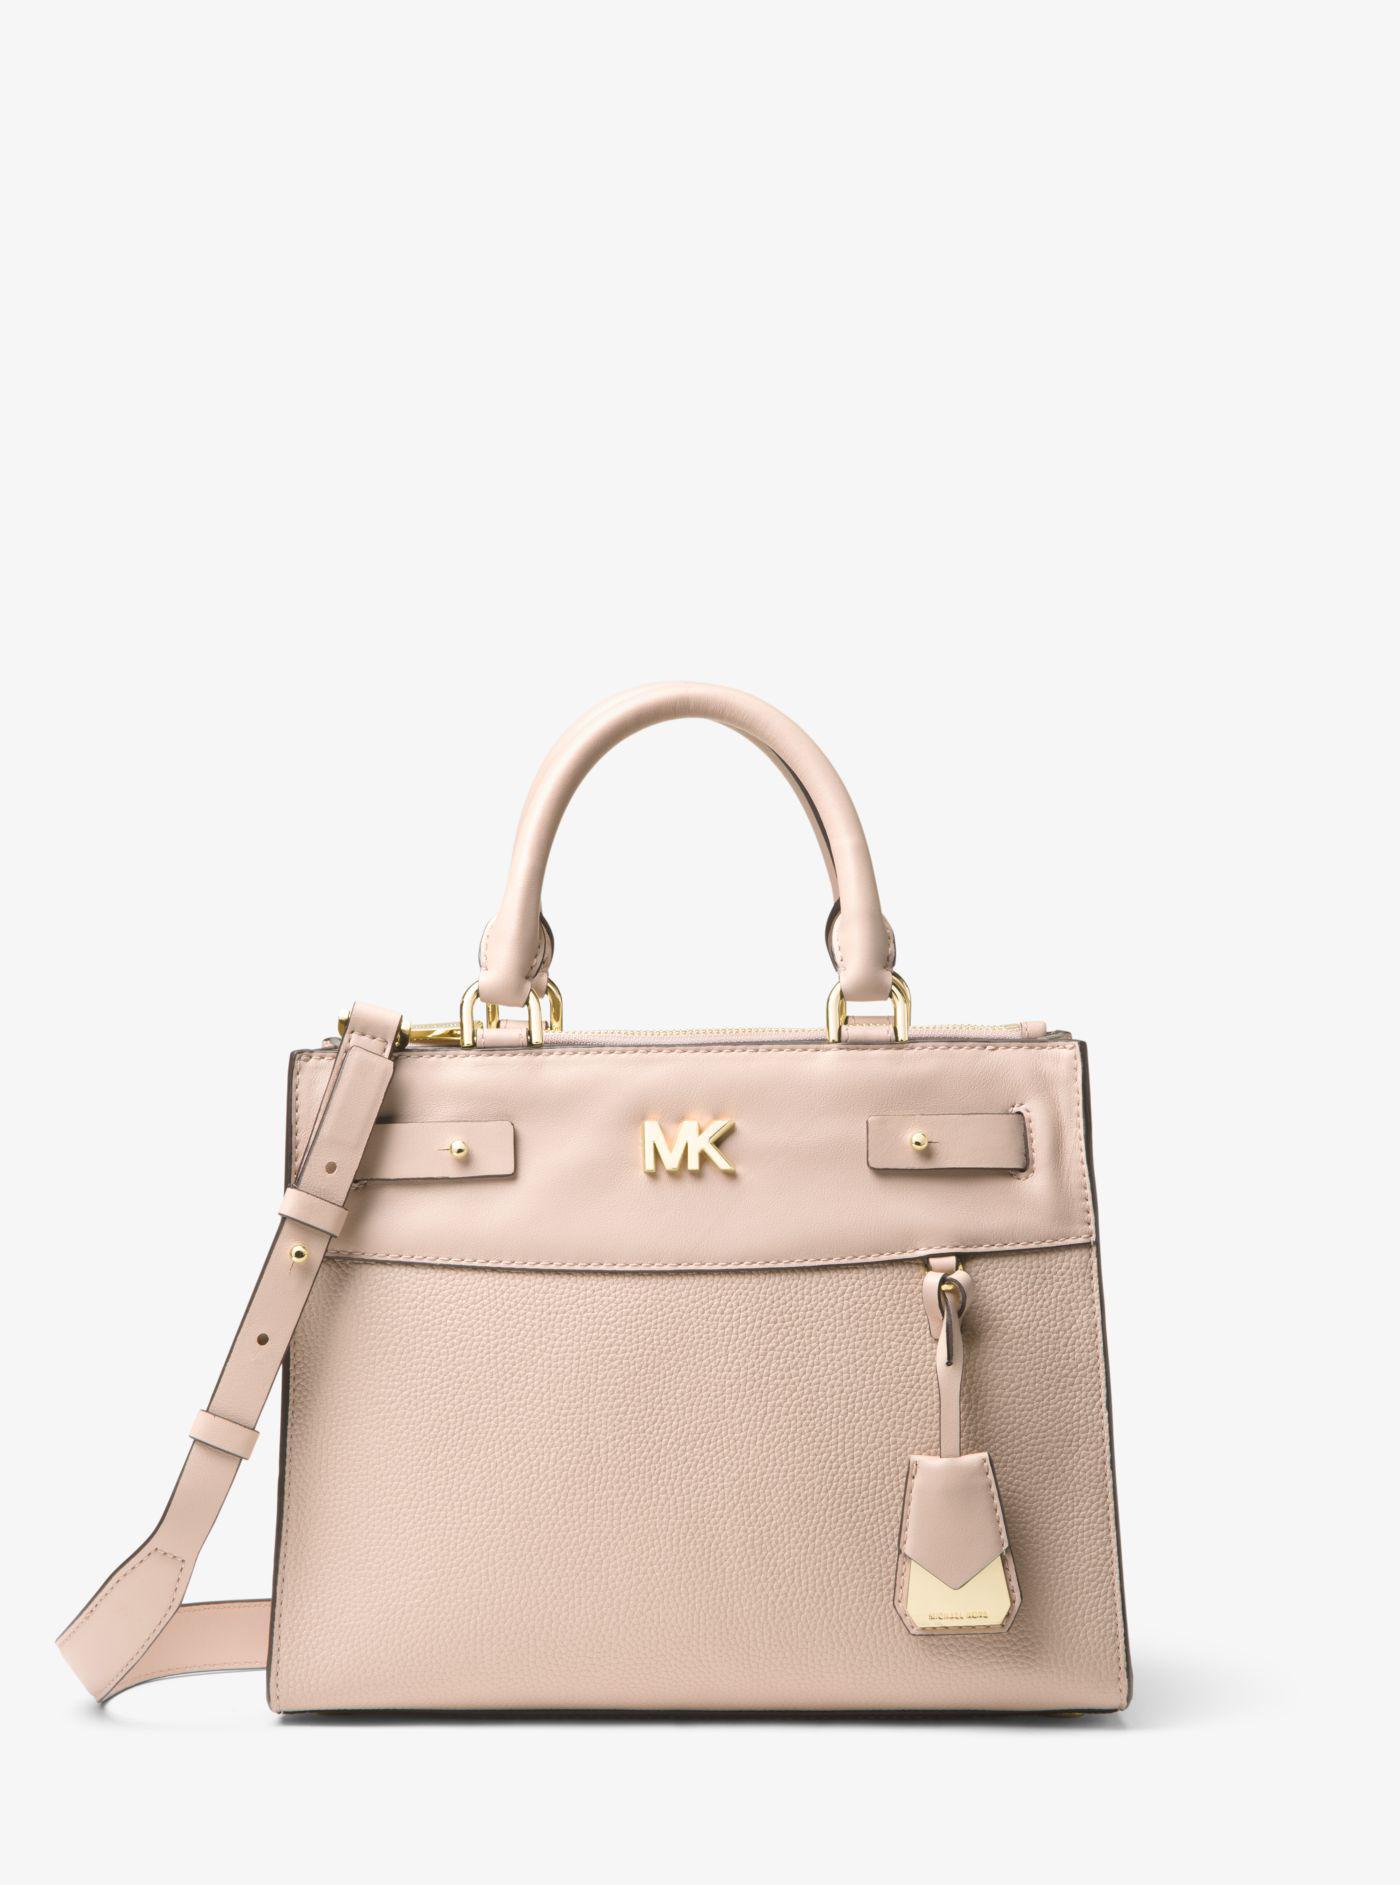 9883f6afaa677c Michael Kors Reagan Medium Leather Satchel in Pink - Lyst